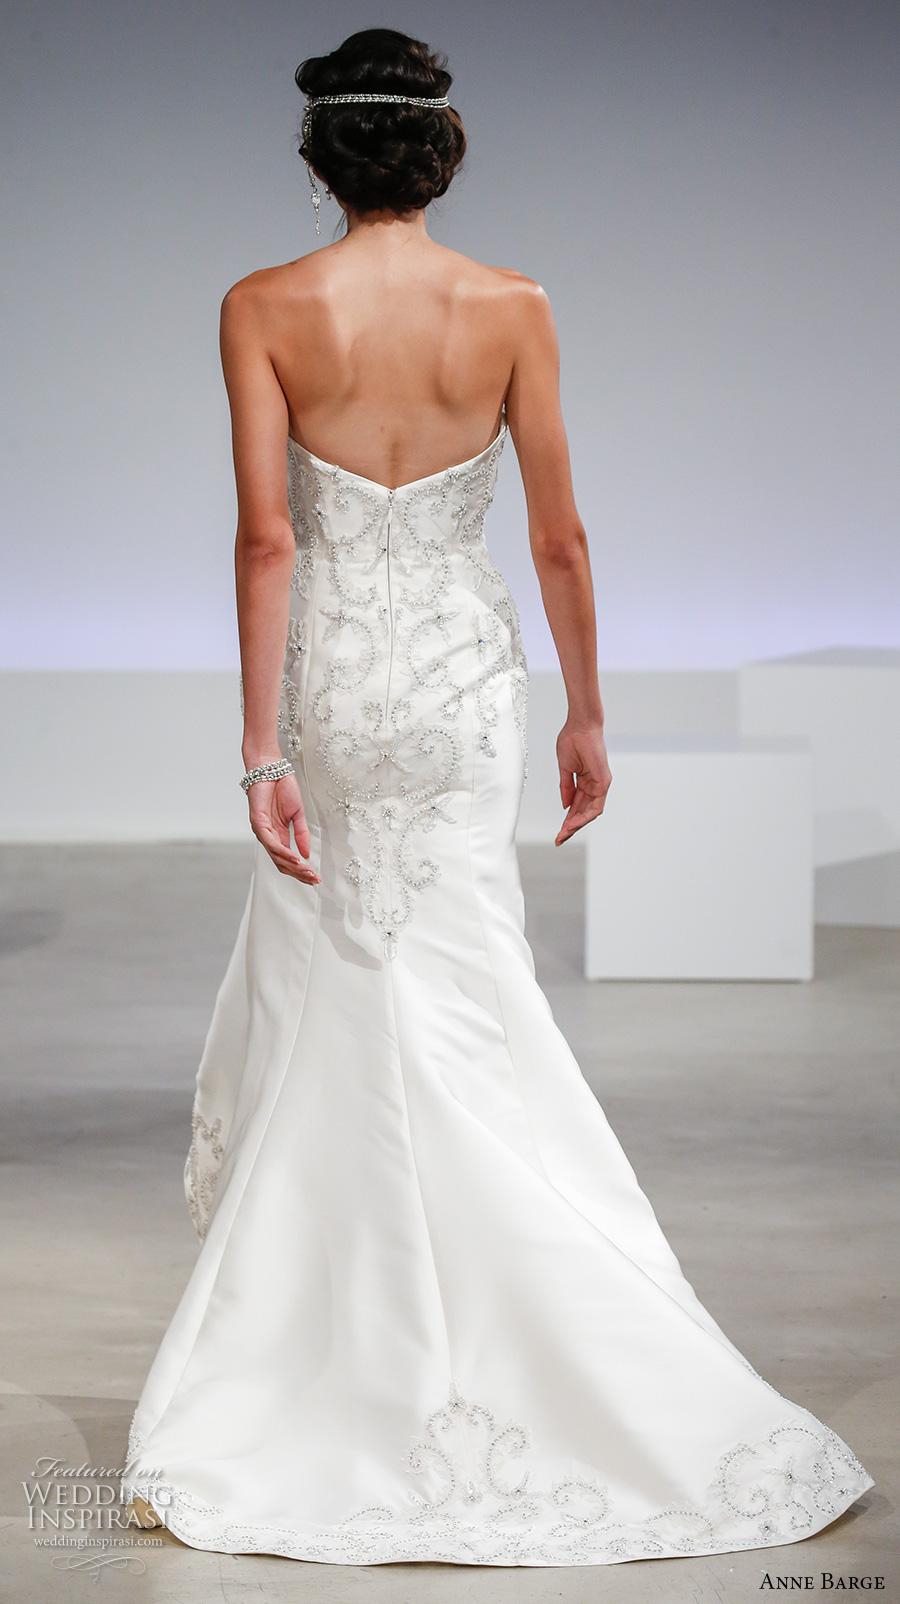 Anne barge fall 2017 wedding dresses wedding inspirasi for Strapless wedding dresses 2017